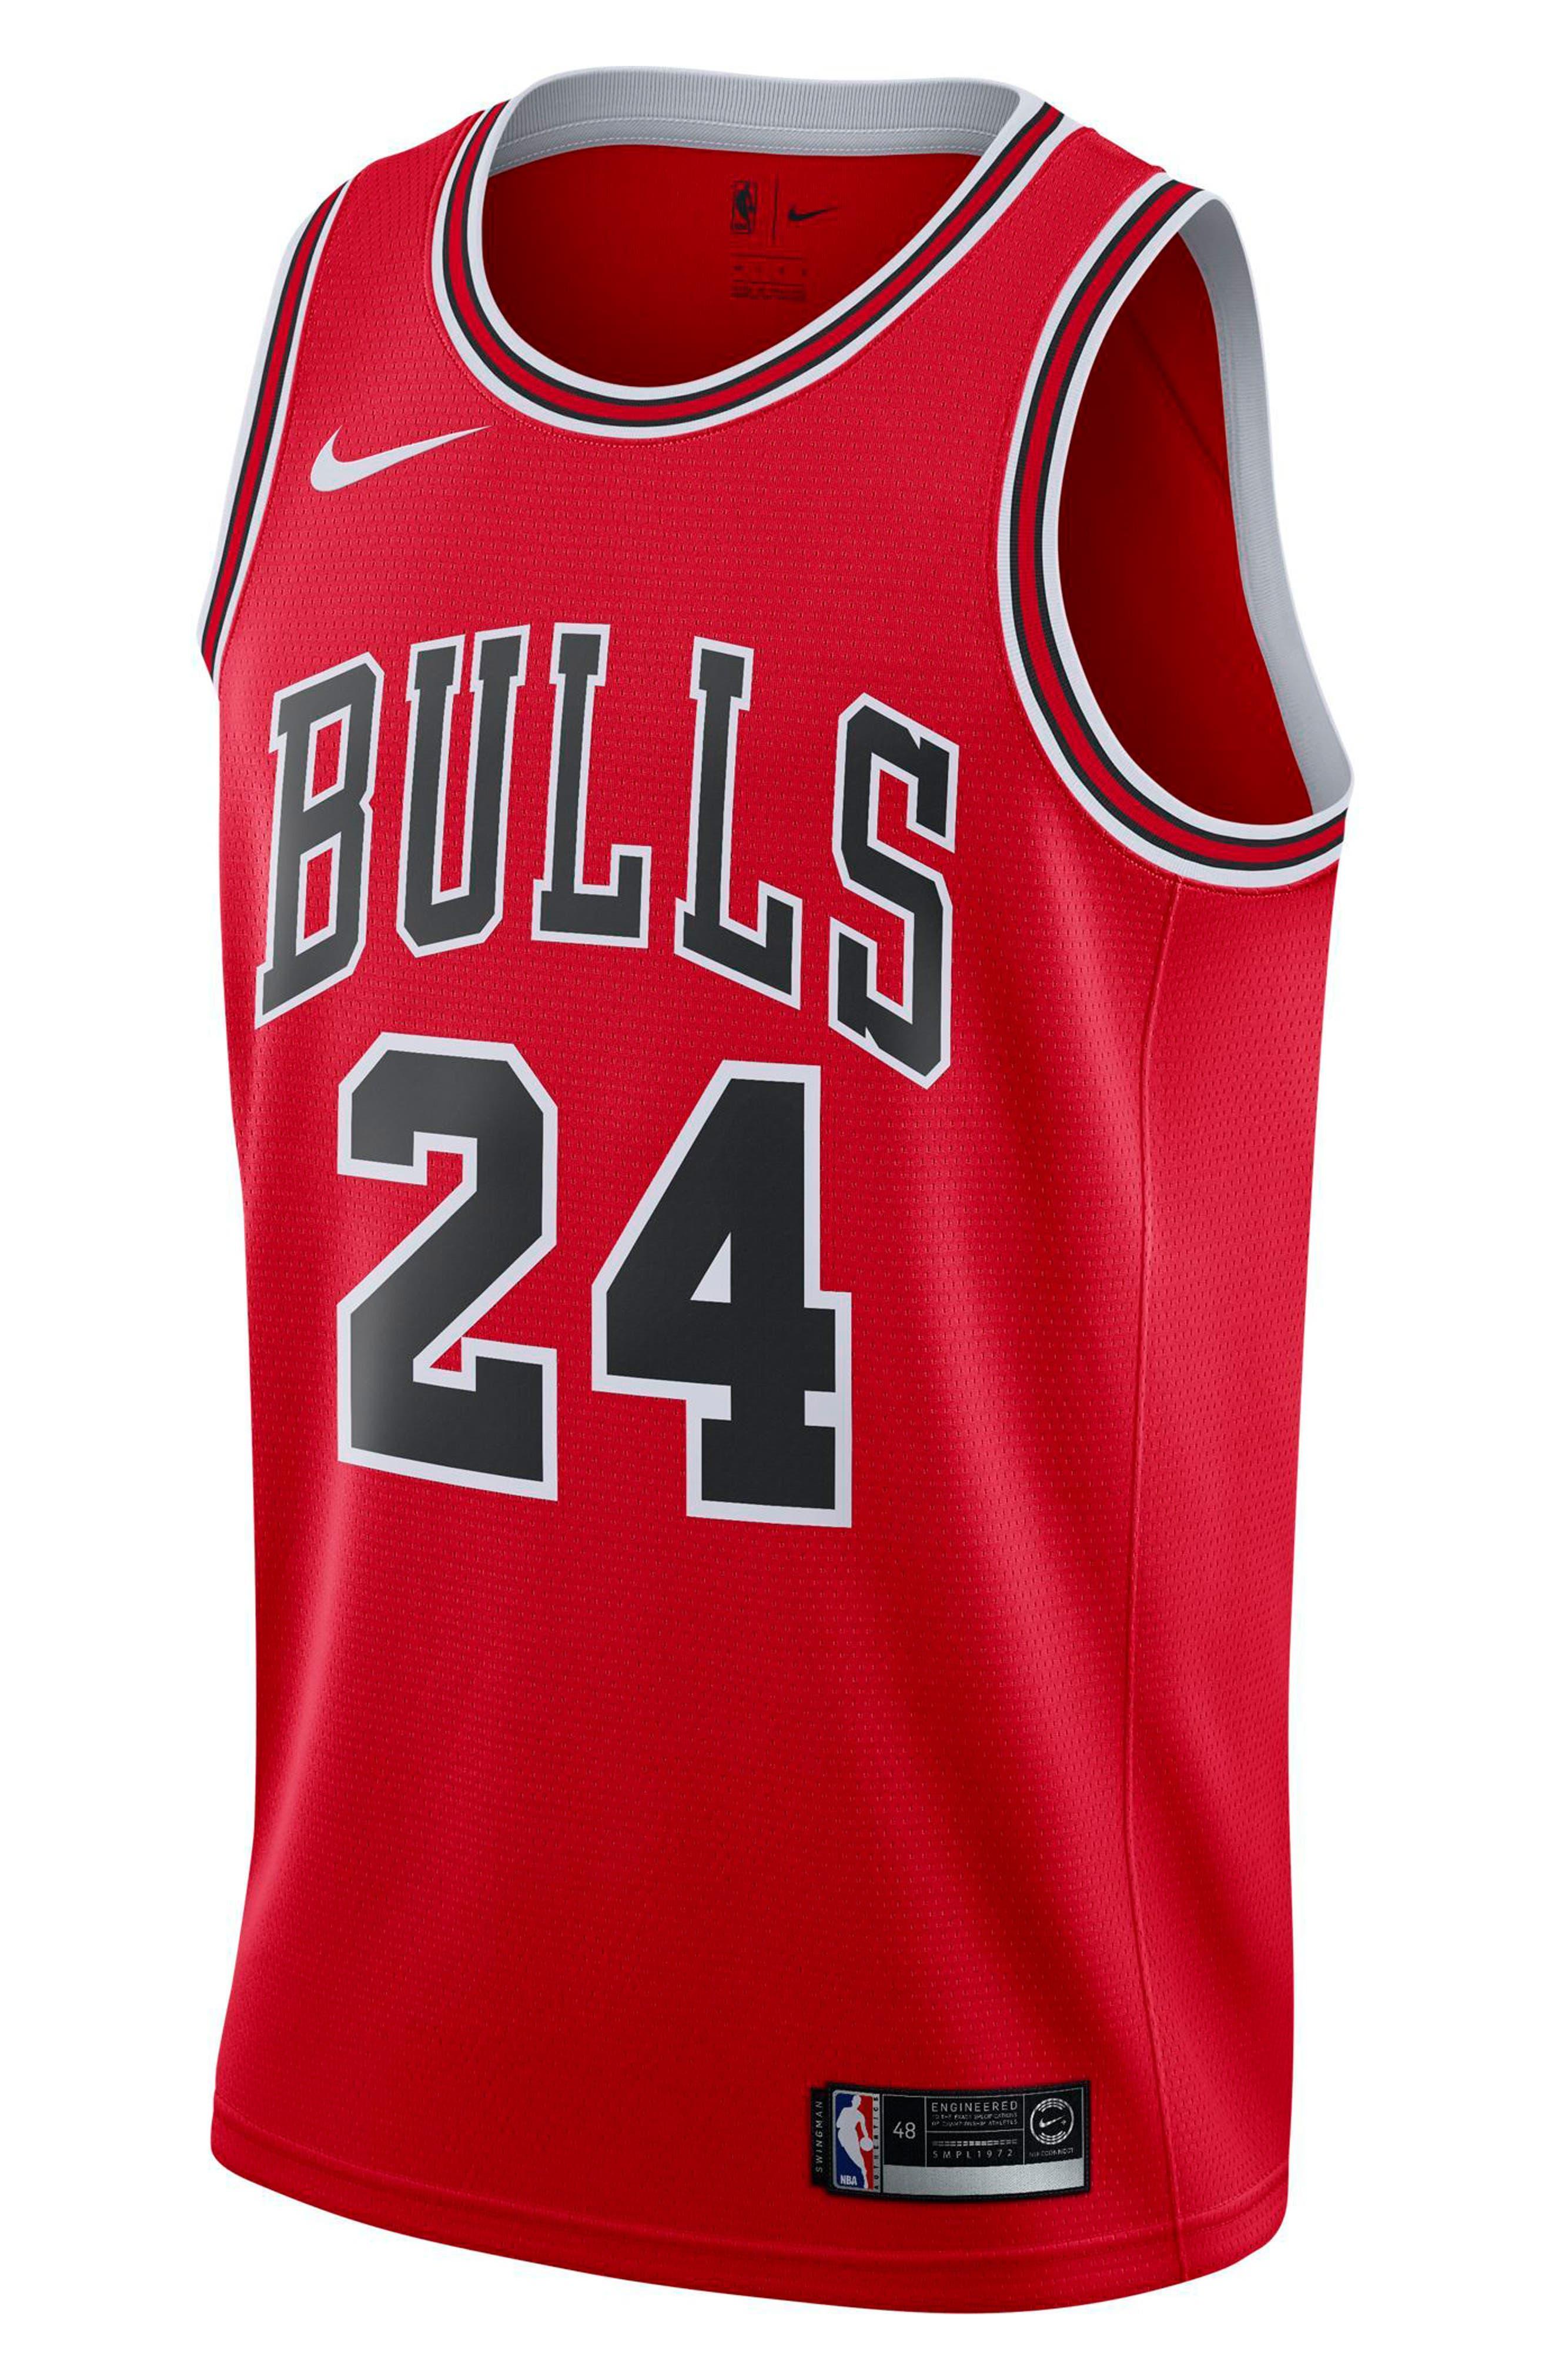 Main Image - Nike Chicago Bulls Icon Edition Swingman Women's NBA Jersey